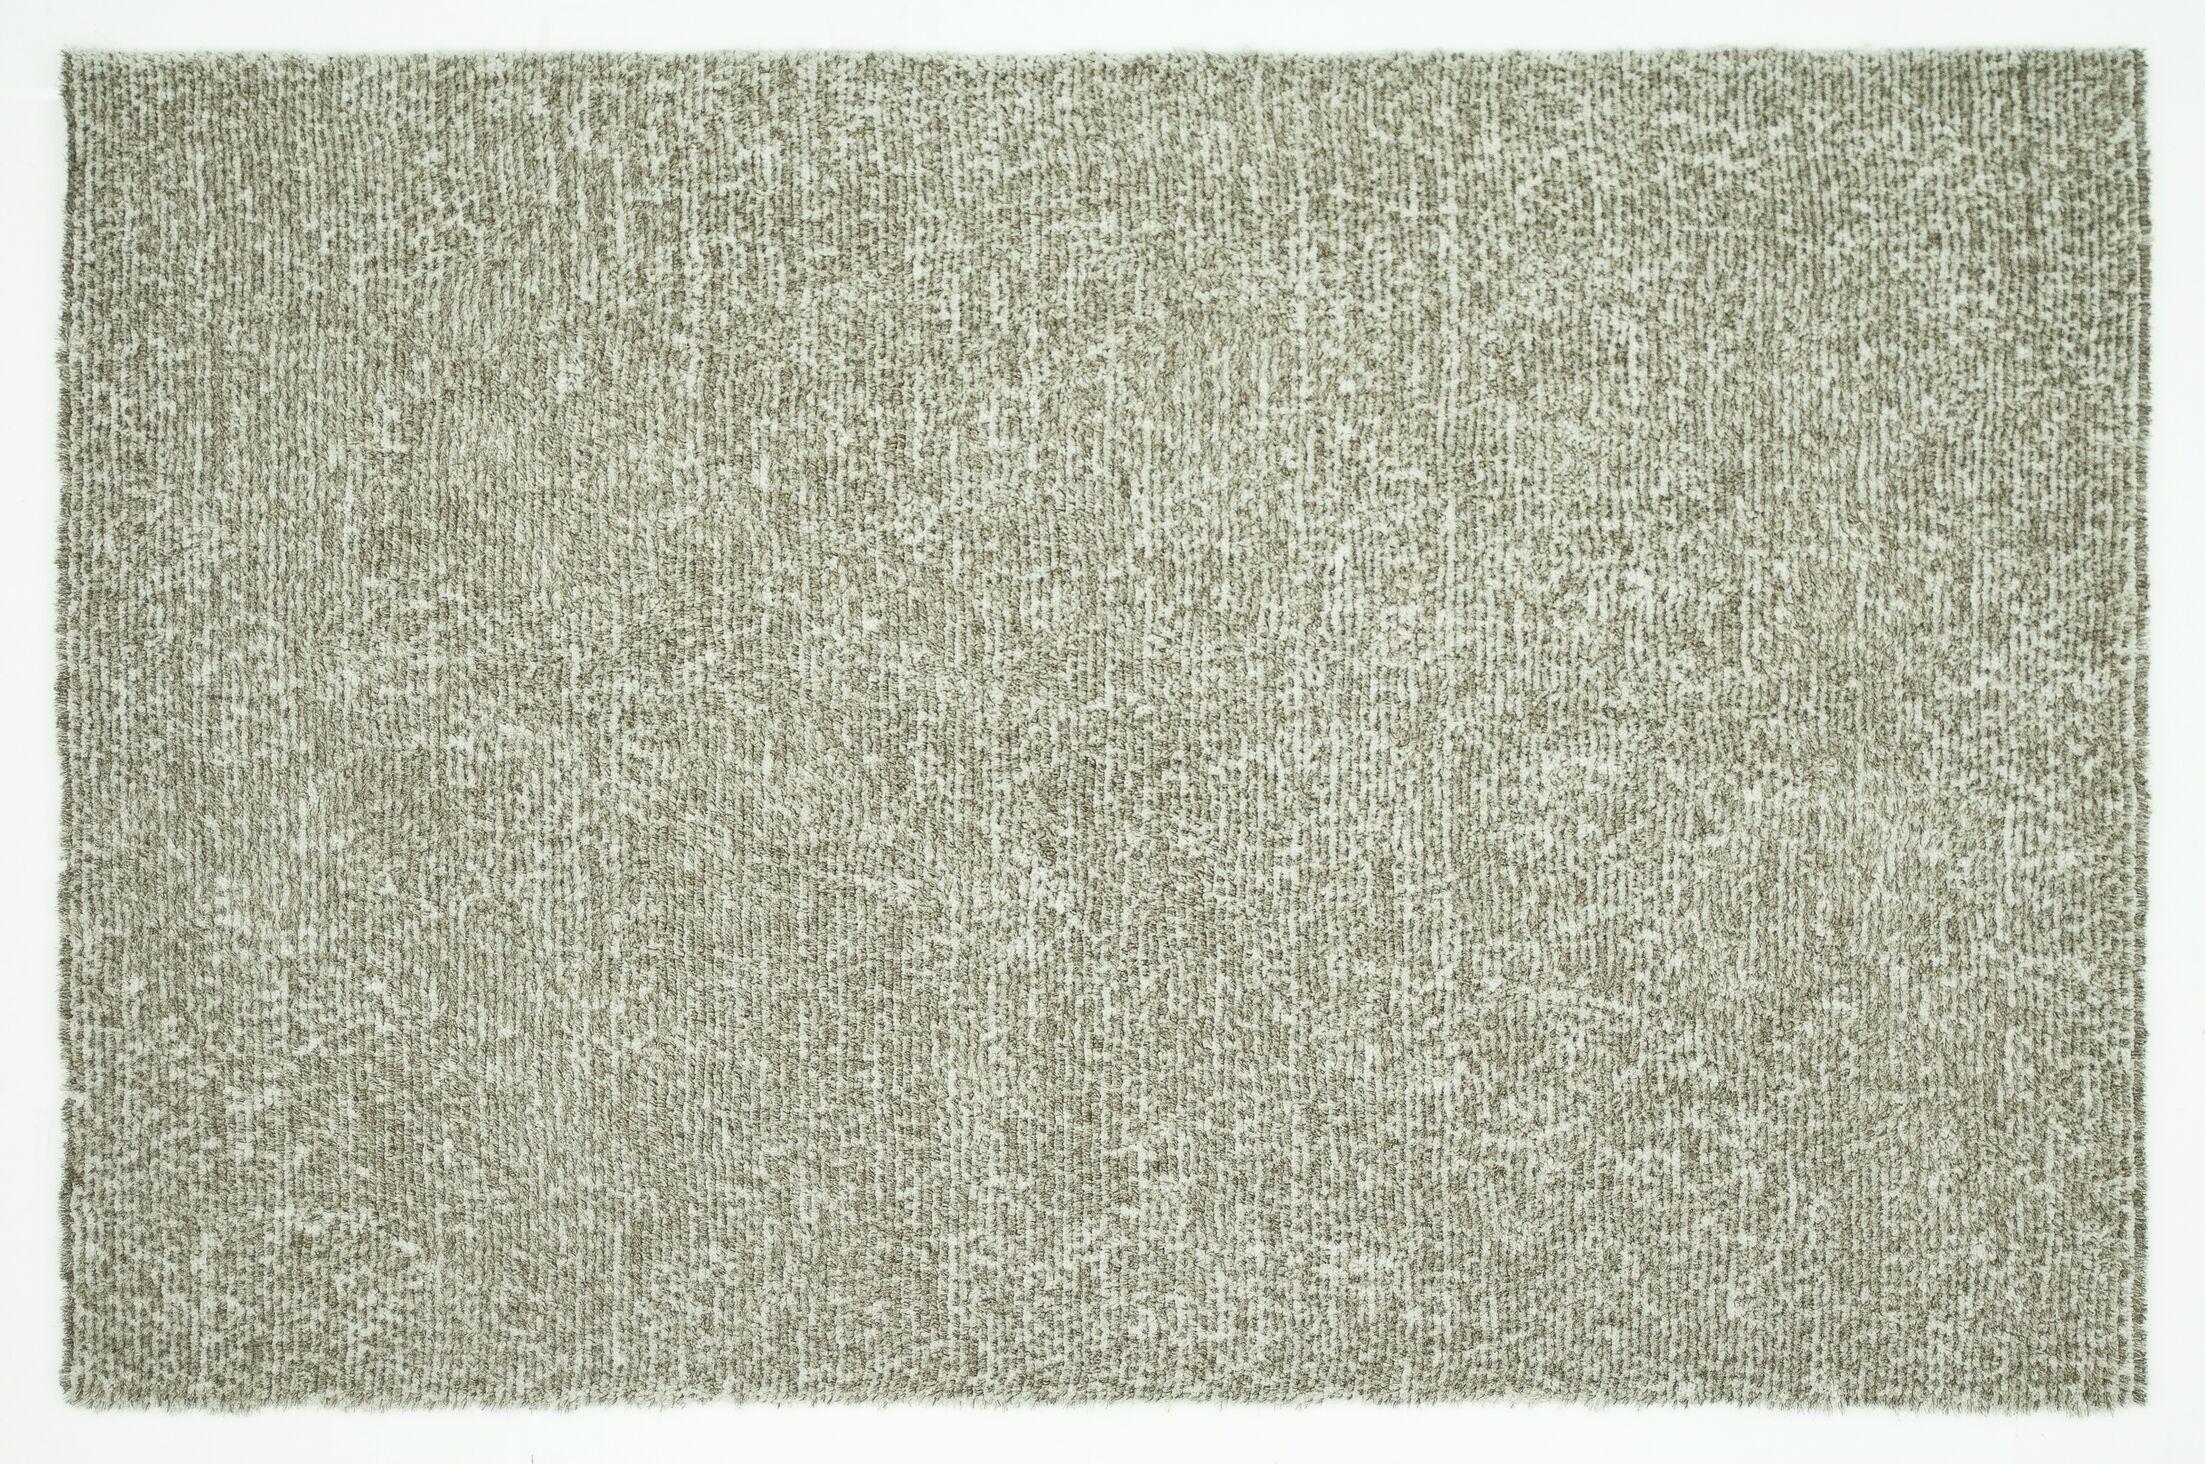 Baryzhikova Hand-Tufted Light Gray Area Rug Rug Size: Rectangle 5' x 7'6